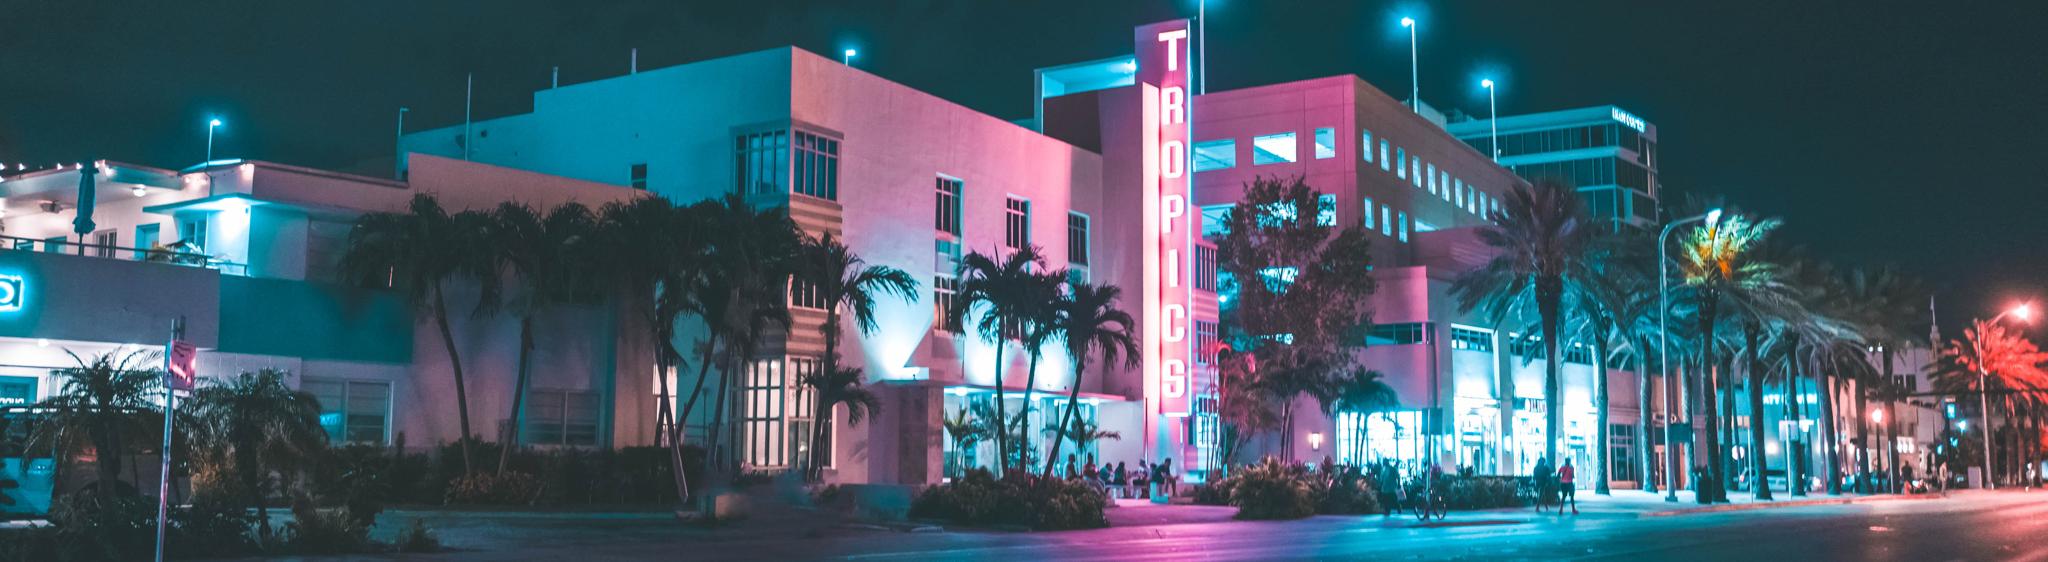 Pedal Bar Miami - Best Bachelorette Party Pedal Pub Crawl in Miami, Florida